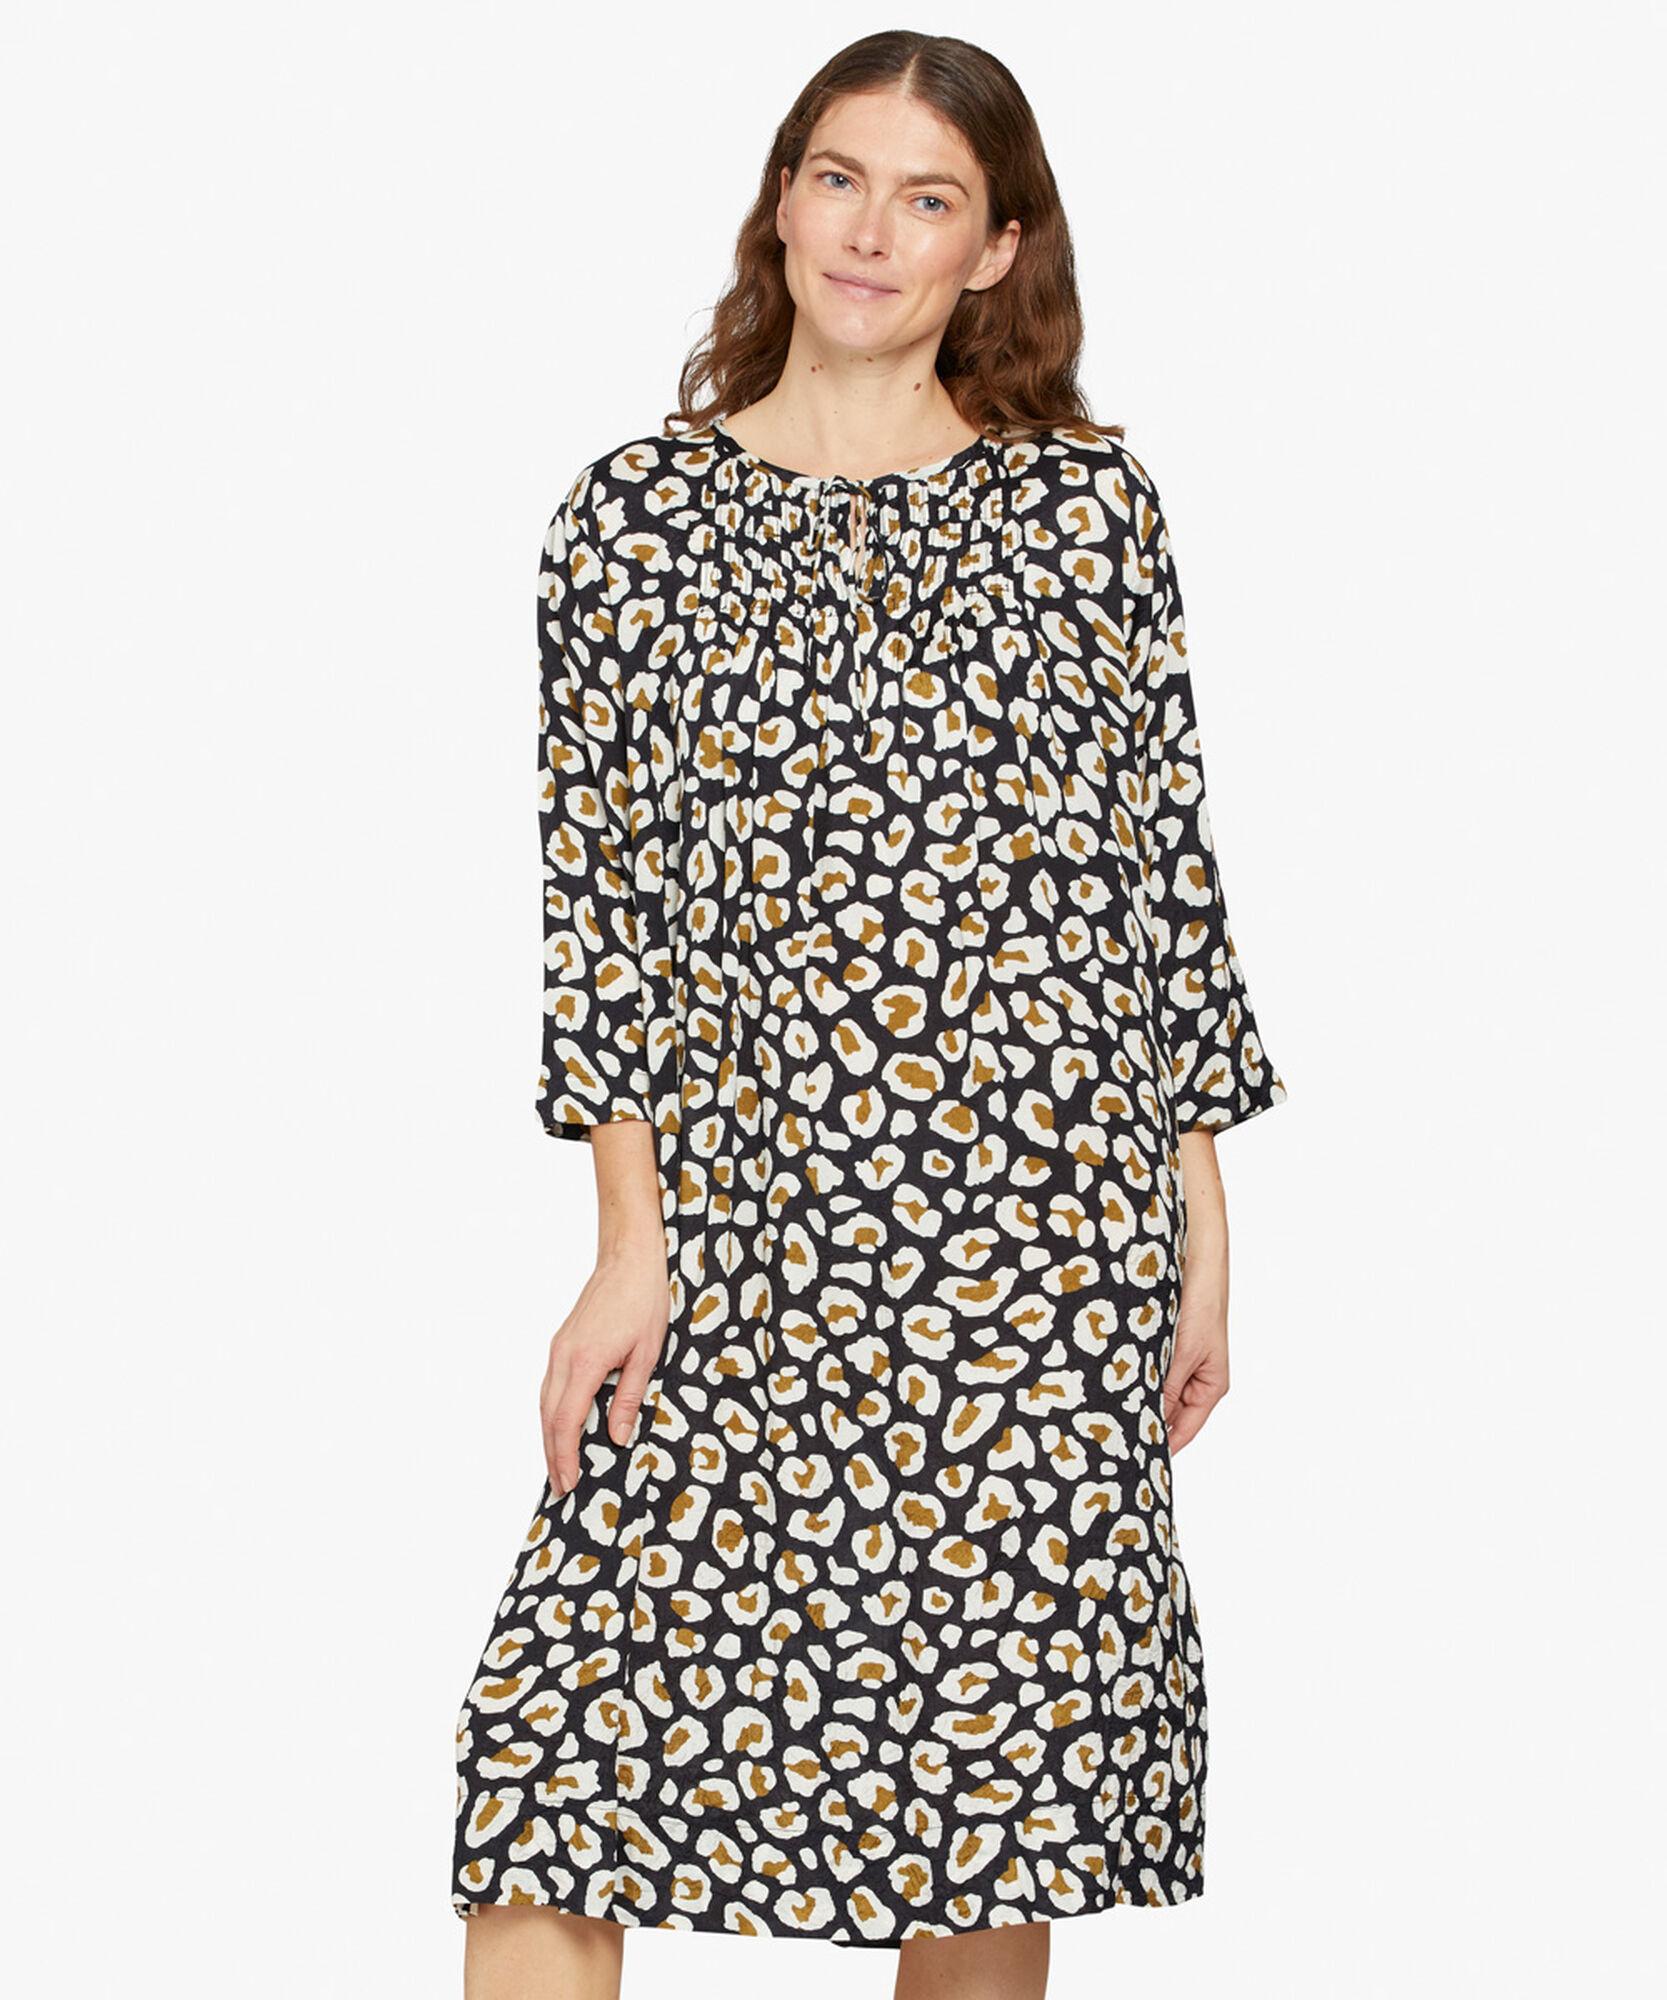 NORISE DRESS, Beech, hi-res